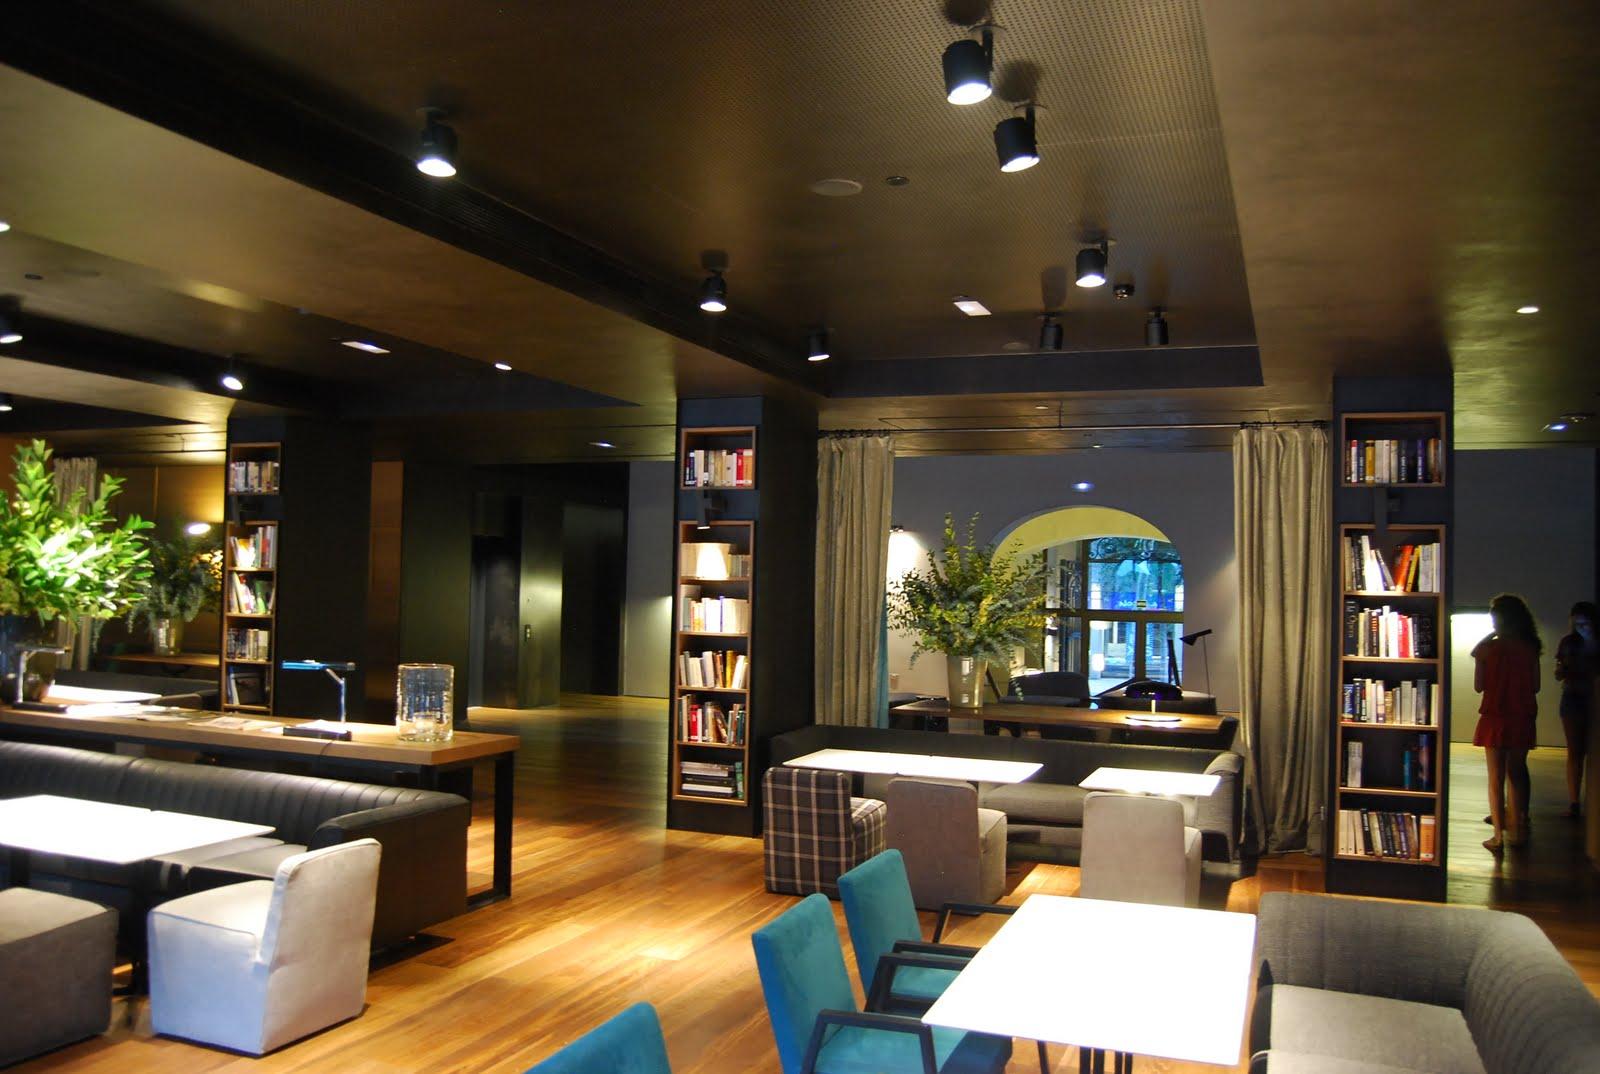 Brillat savarin alma hotel 5 gl y restaurante - Restaurante alma barcelona ...